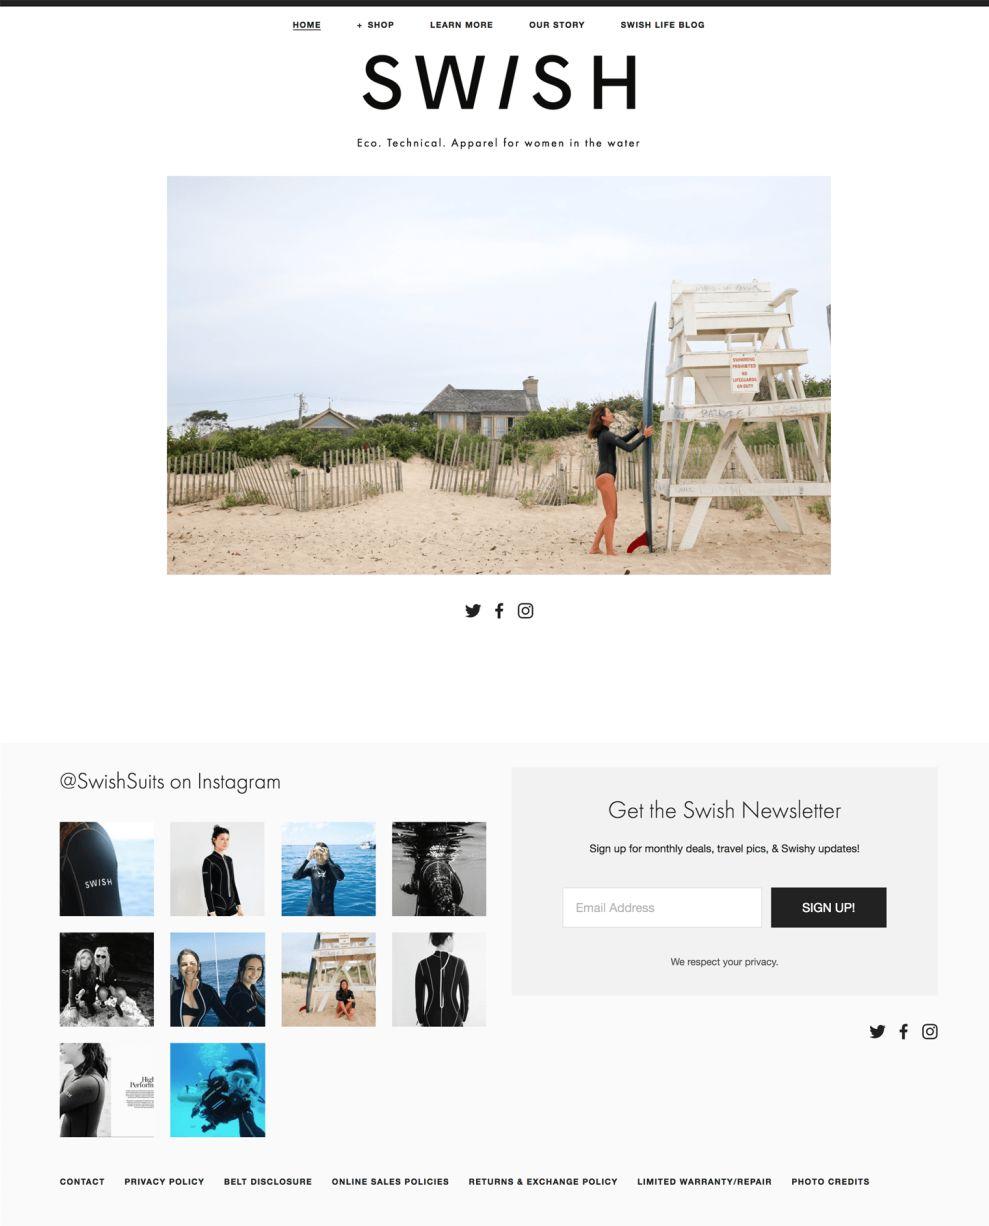 Swish Suits Top Homepage